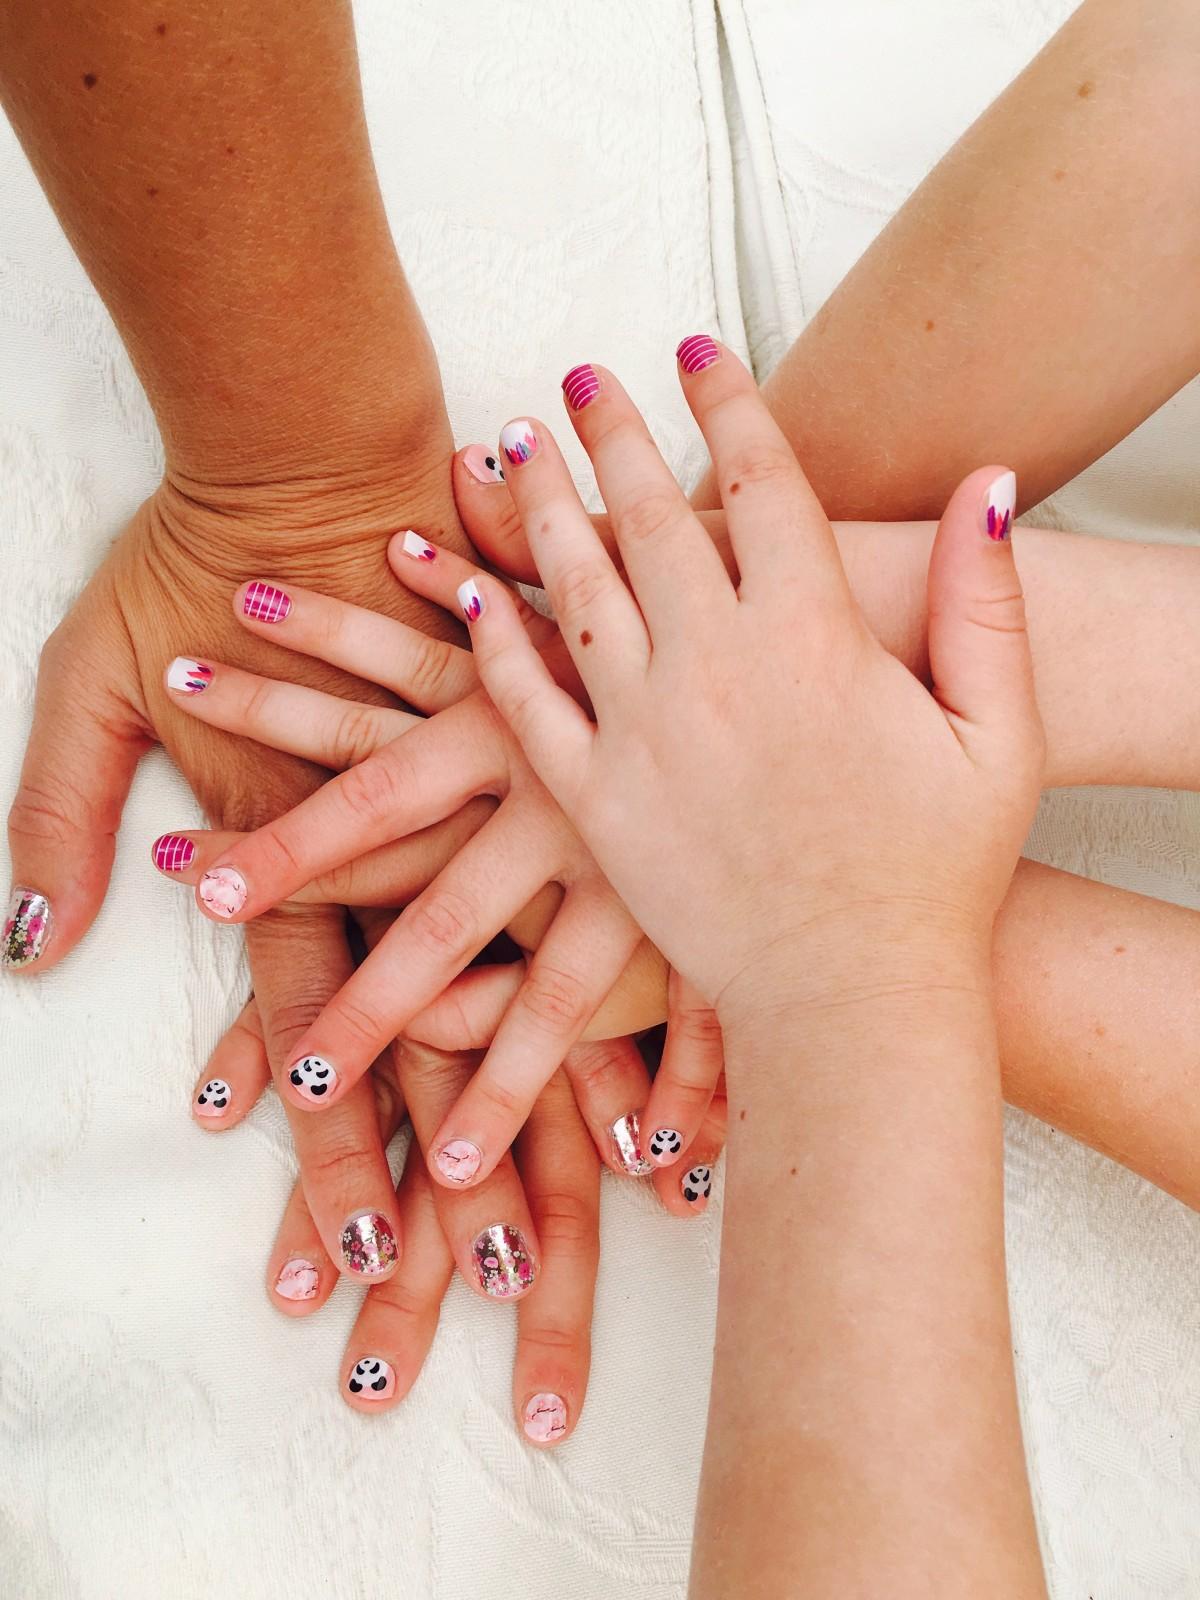 Harrogate Mama, Harrogate Mama Blog, Jamberry, Nails, Nail Wraps, Harrogate, Yorkshire, Blogger, Harrogate, Mama, Blog,IMG_0933.jpg